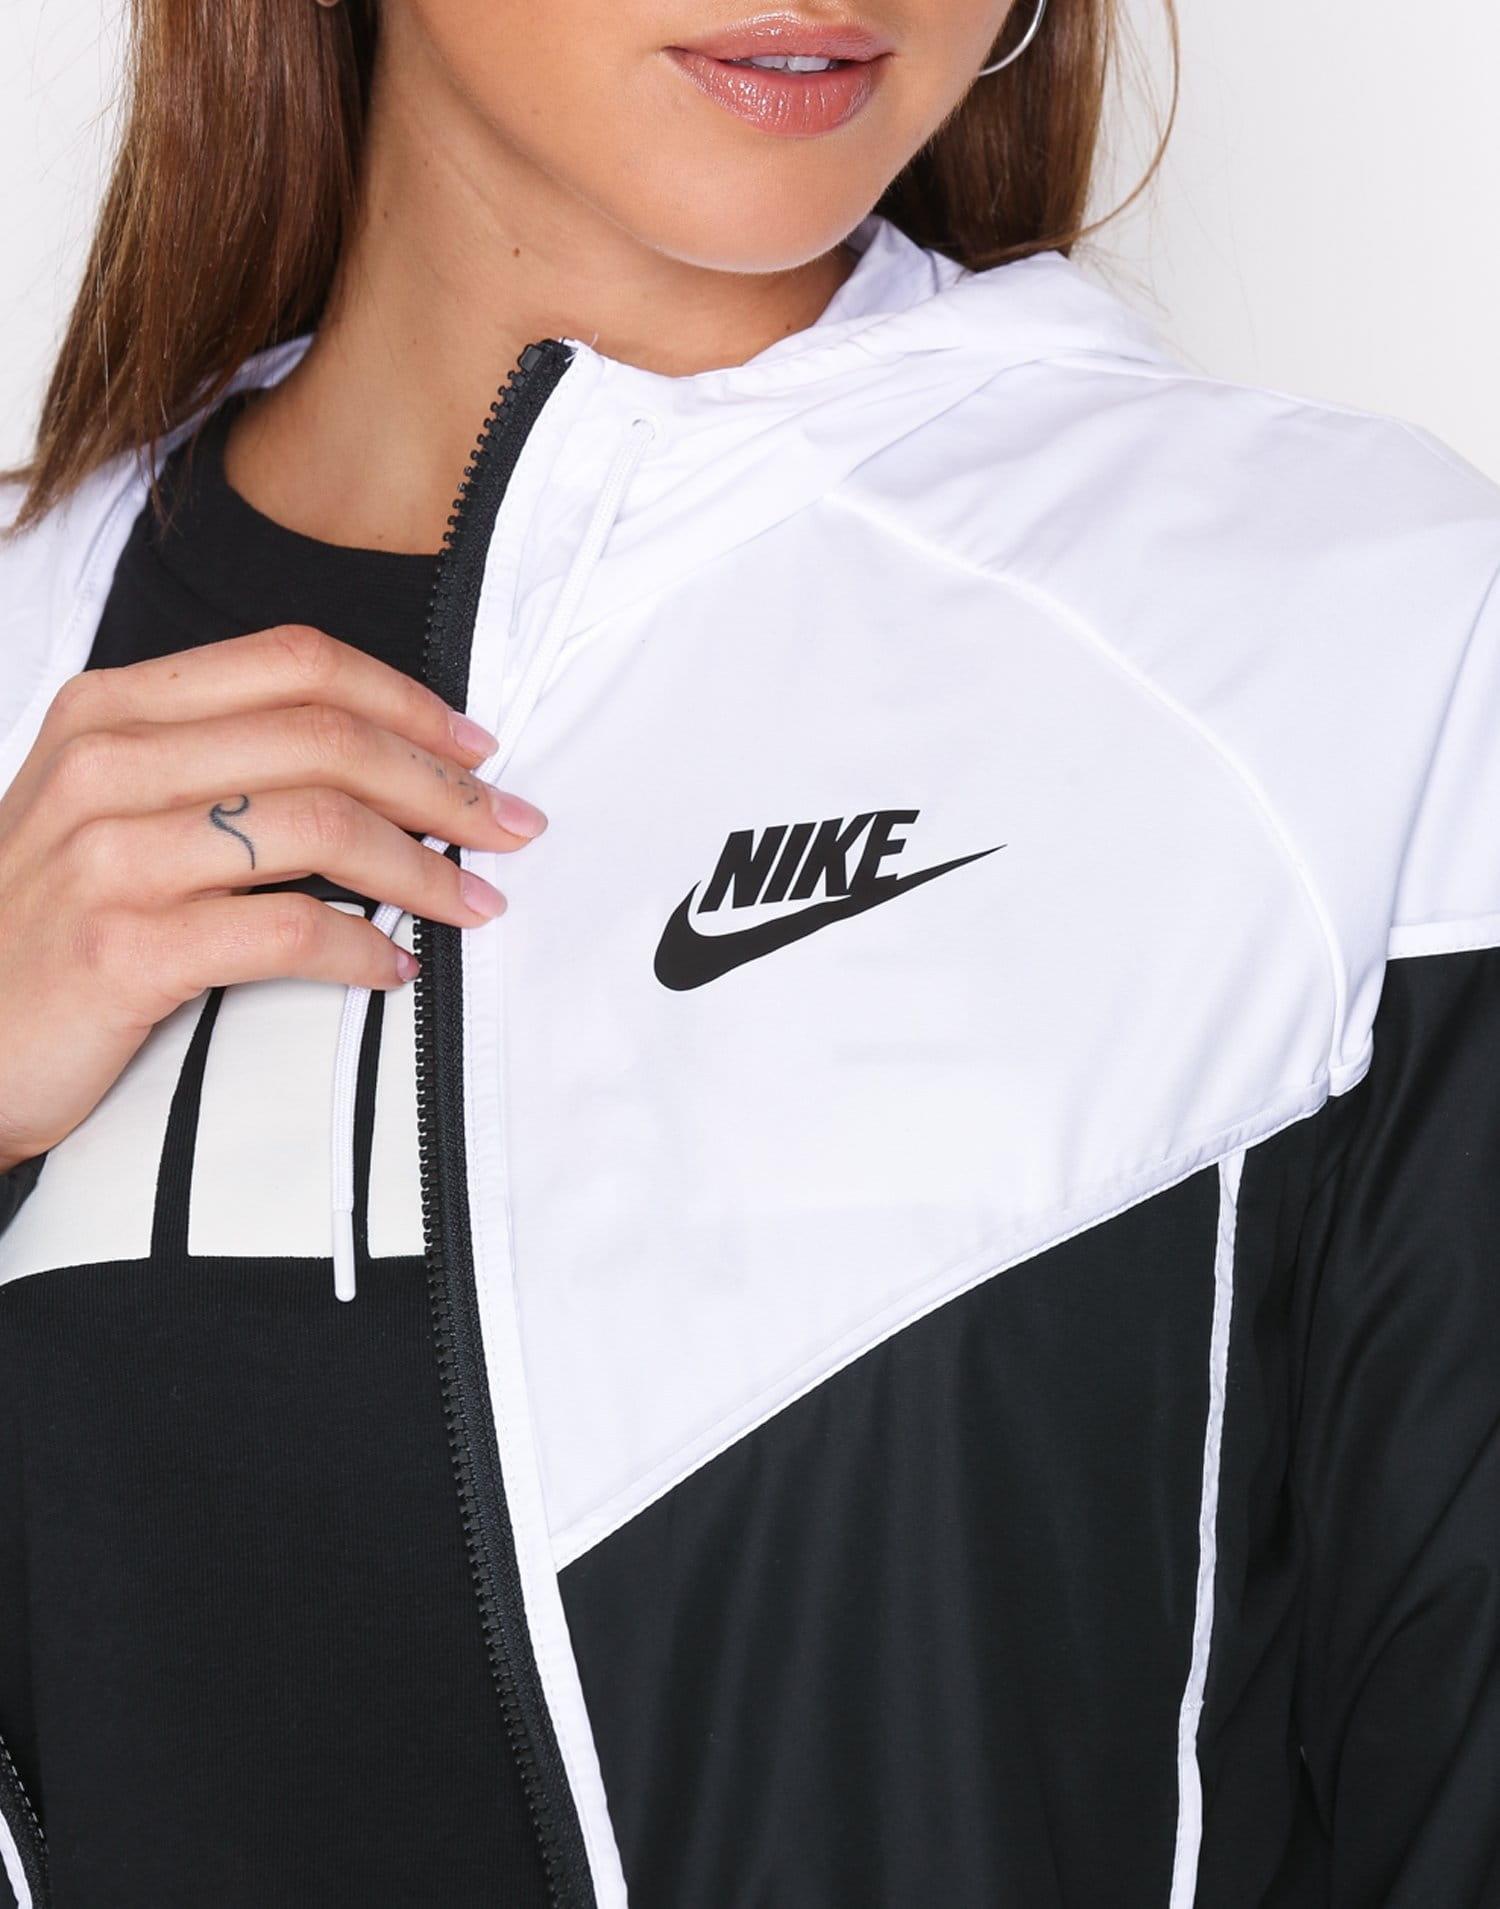 825c1cc4a754b9 Kurtka Damska Nike NSW Windrunner (883495 011) ProSport24.pl ...